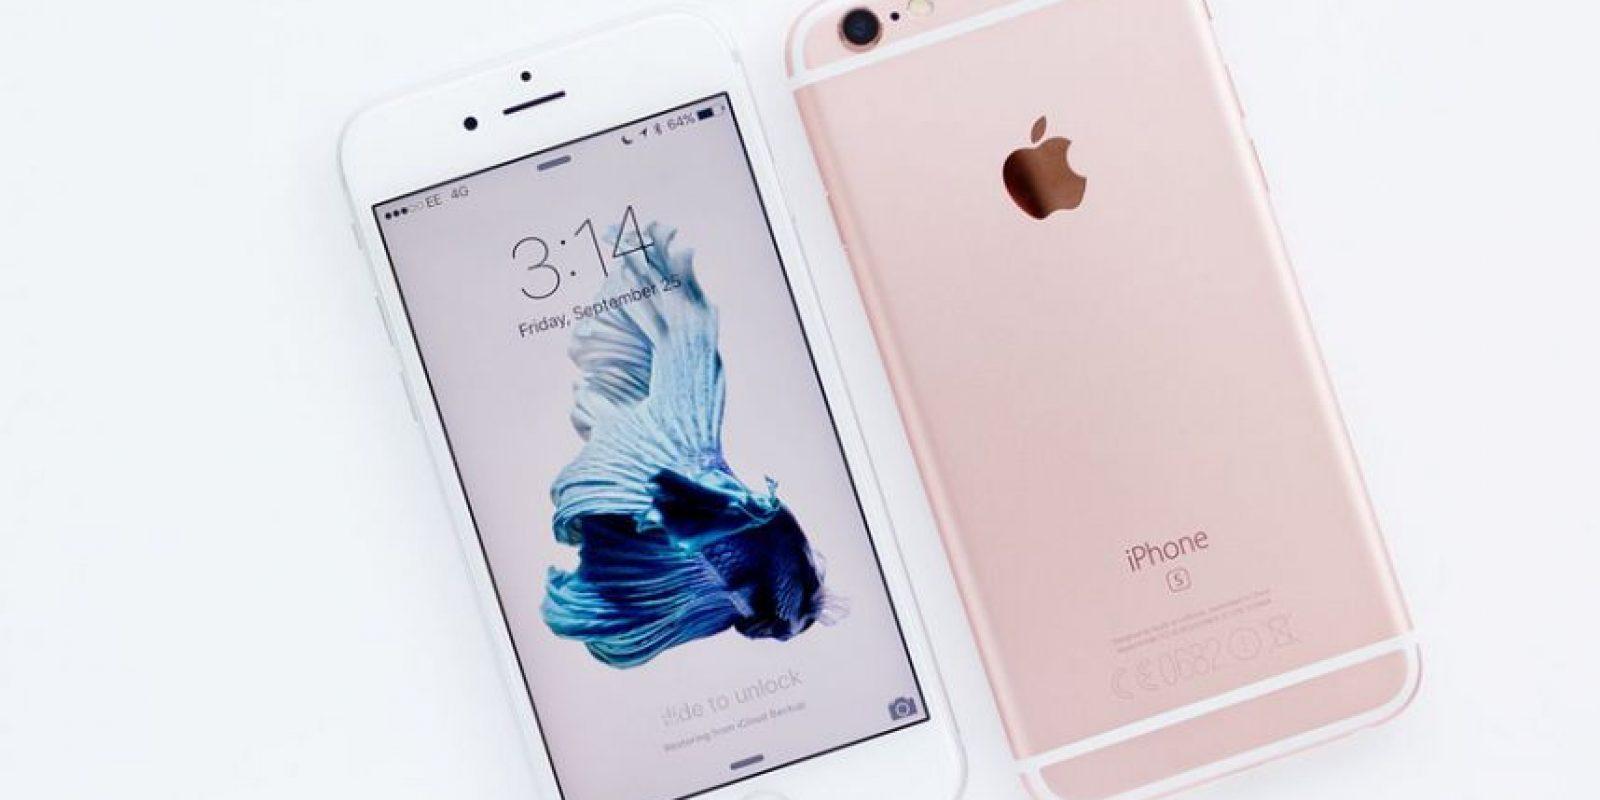 Iphone 6S Foto:apple.com